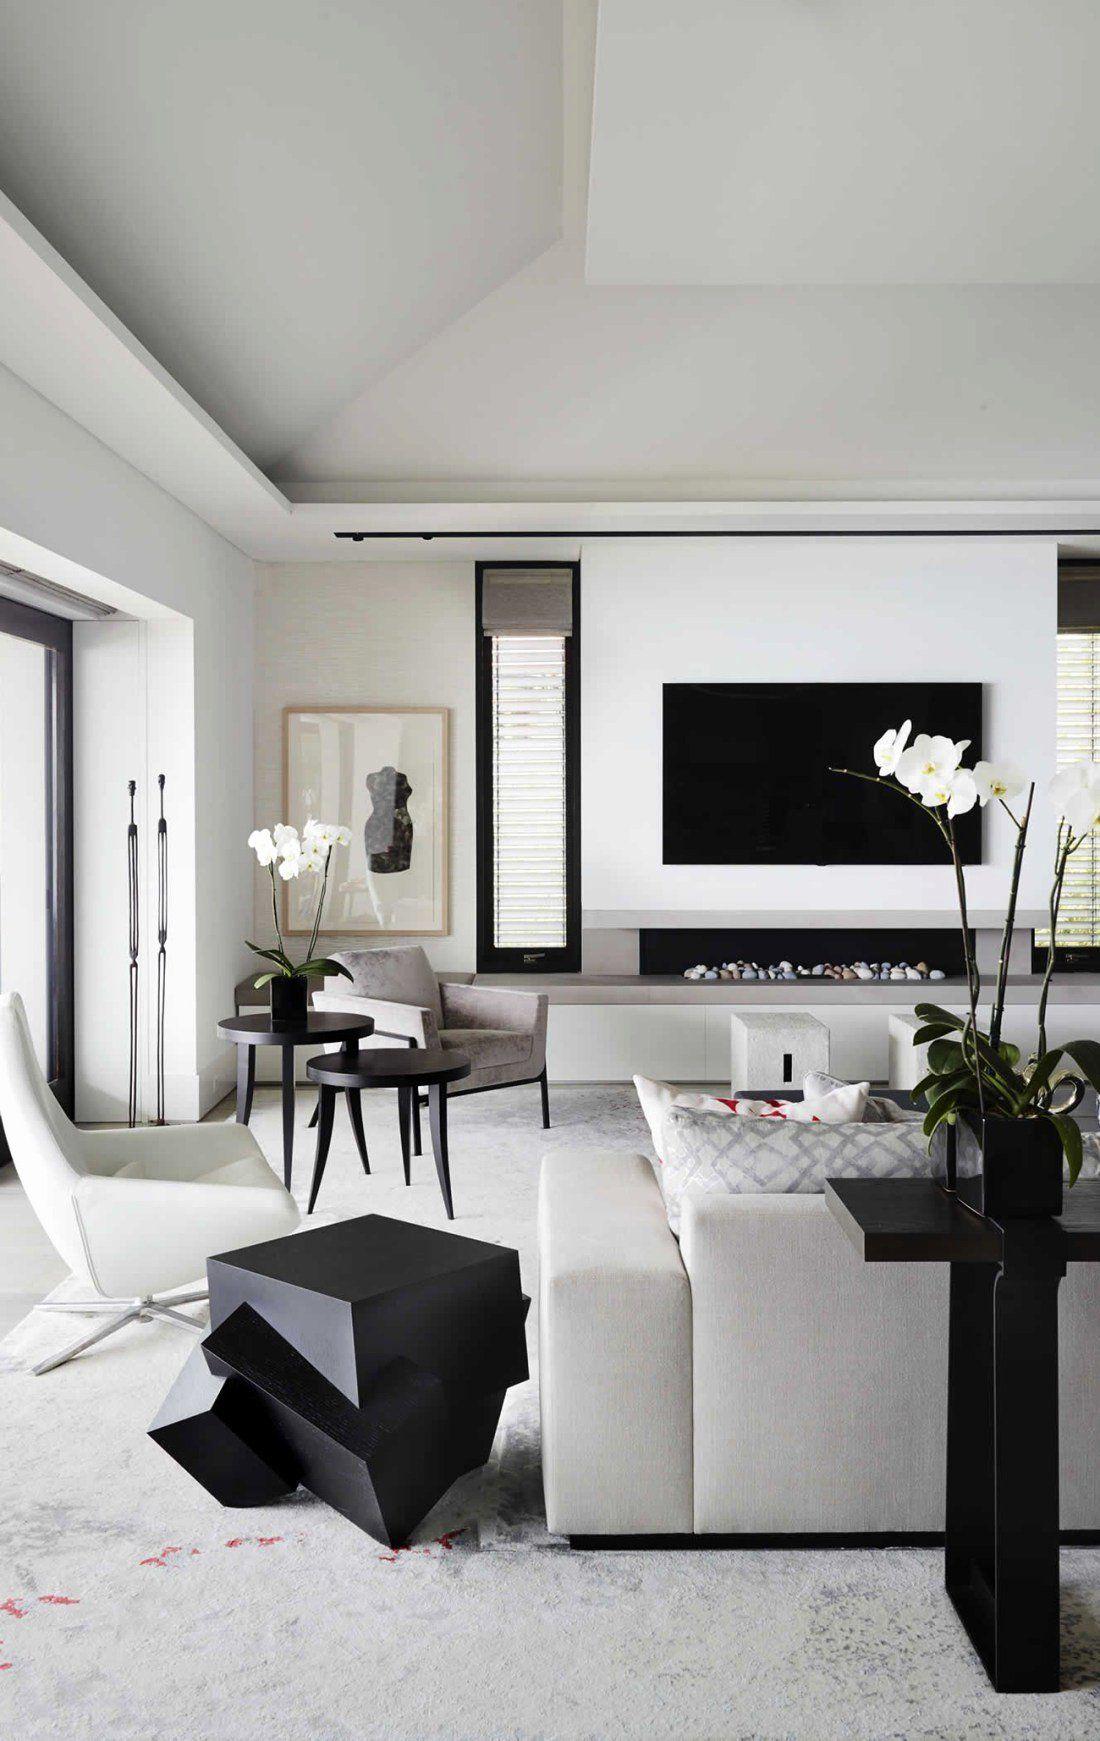 Modern Living Room Interior Fresh Home Decorating Ideas Image Gallery Contemporary Living Room White Monochrome Living Room Living Room White